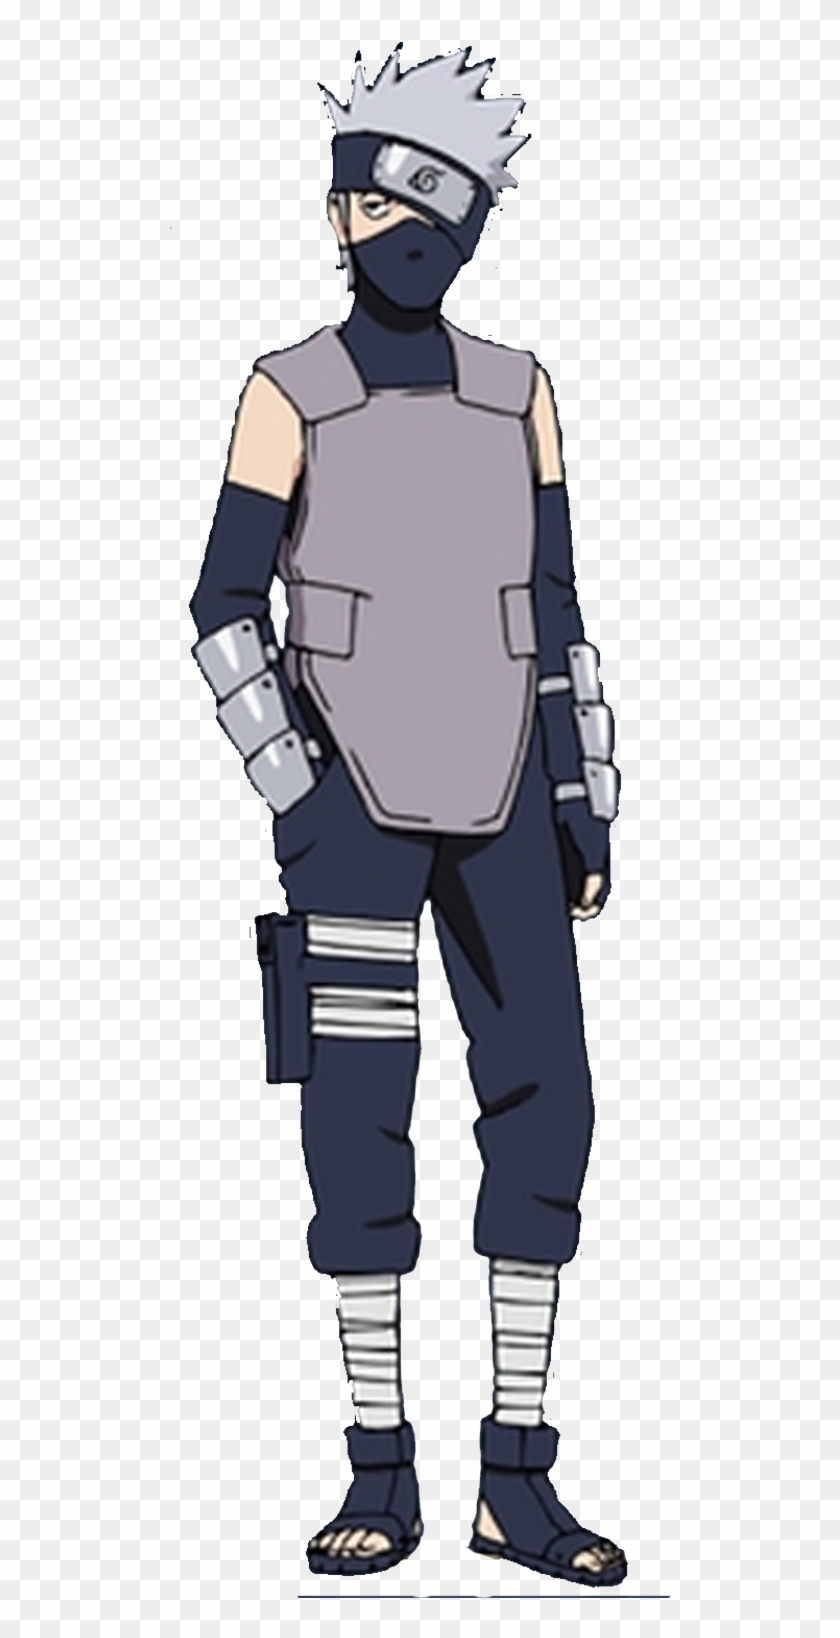 Kakashi Anbu, Naruto Characters, Light Novel, Boruto, - Standing, HD